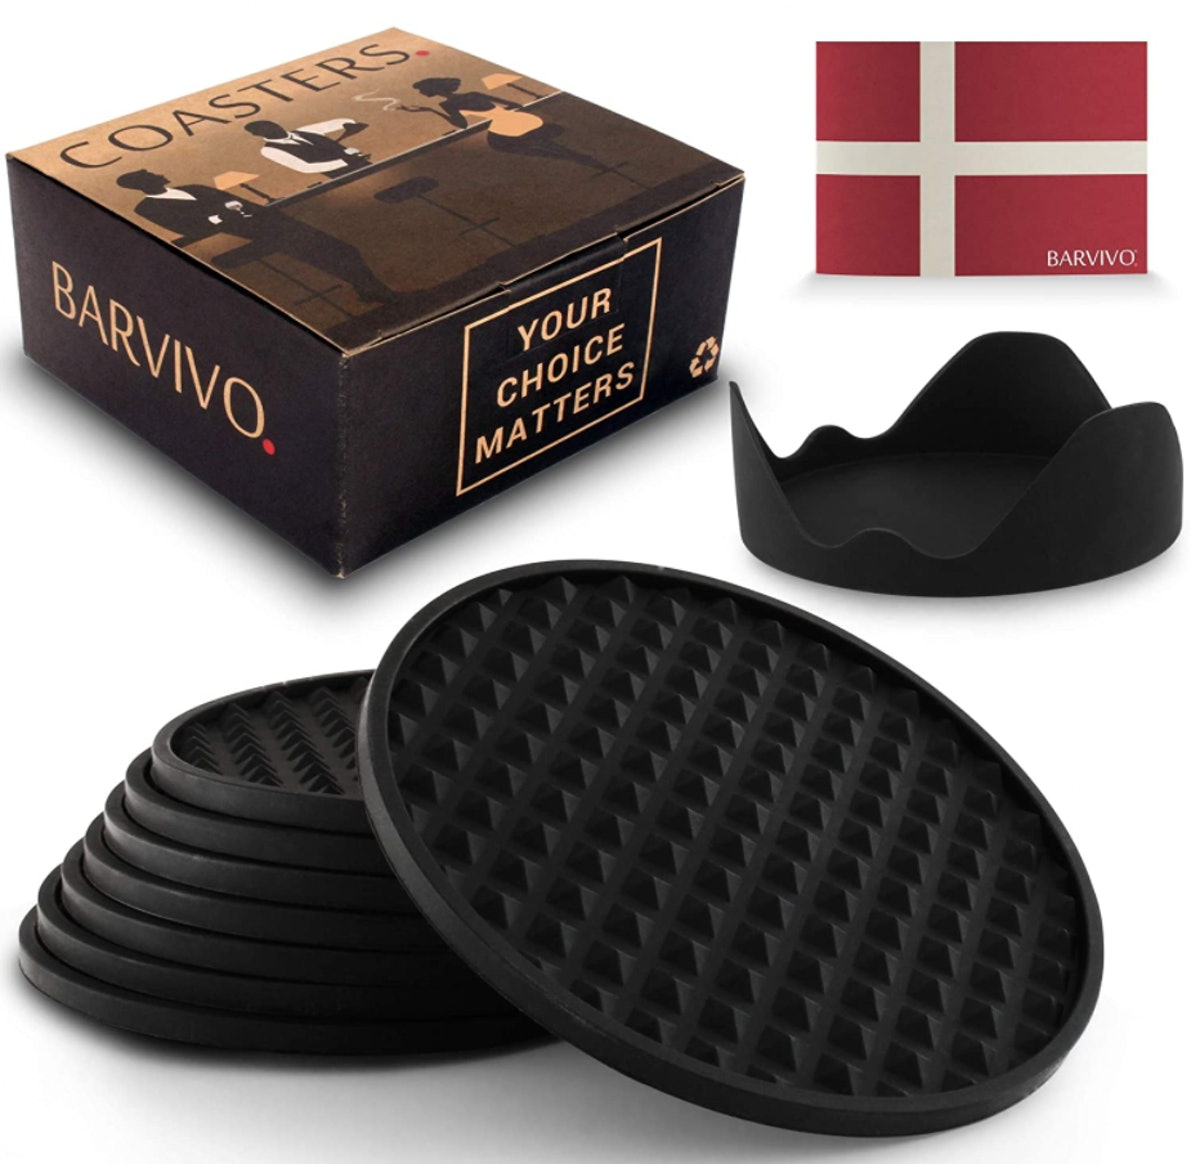 Barvivo Coasters (8-Pack)